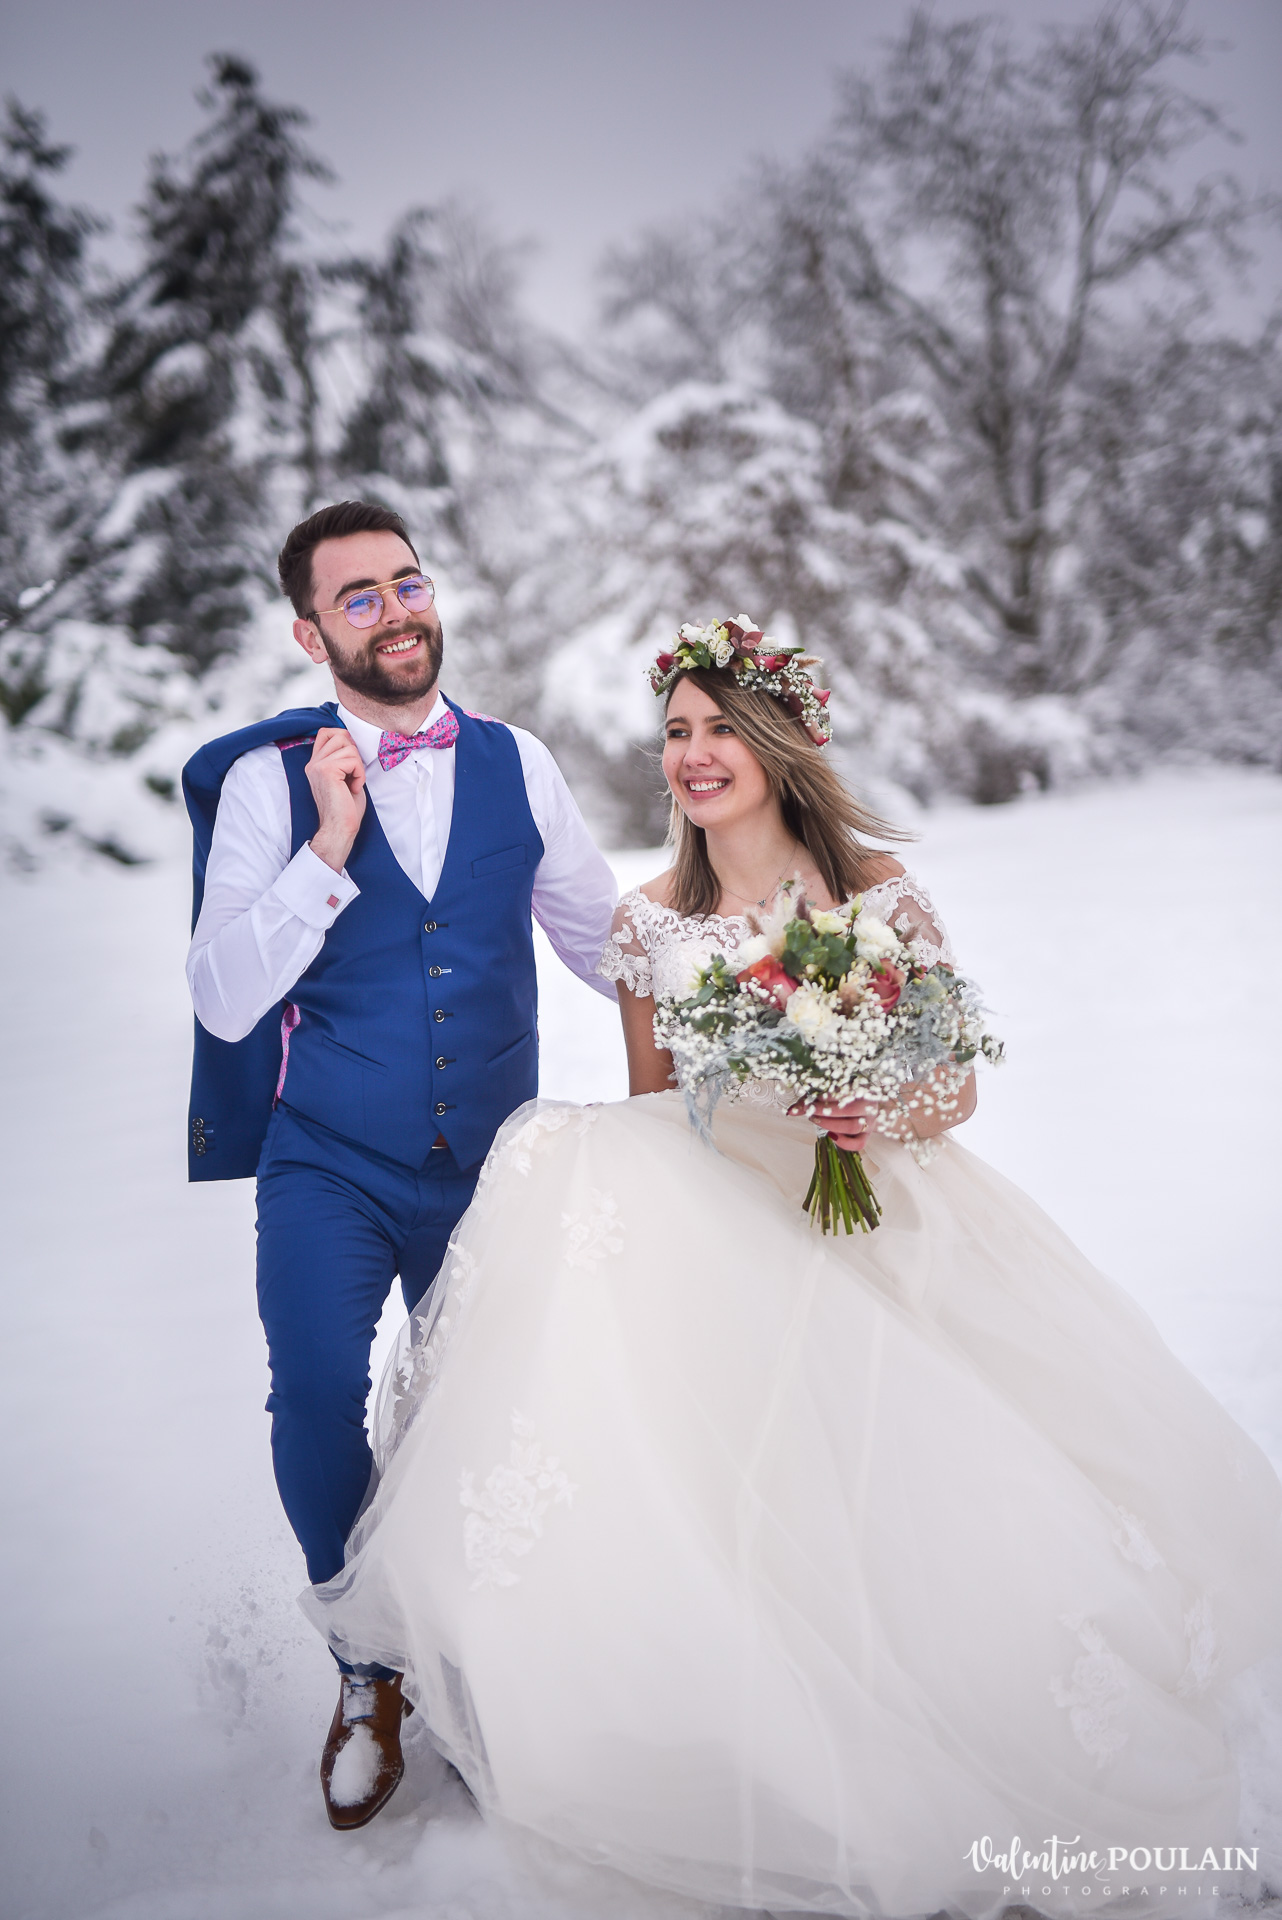 Photo mariage neige hiver - Valentine Poulain avancent